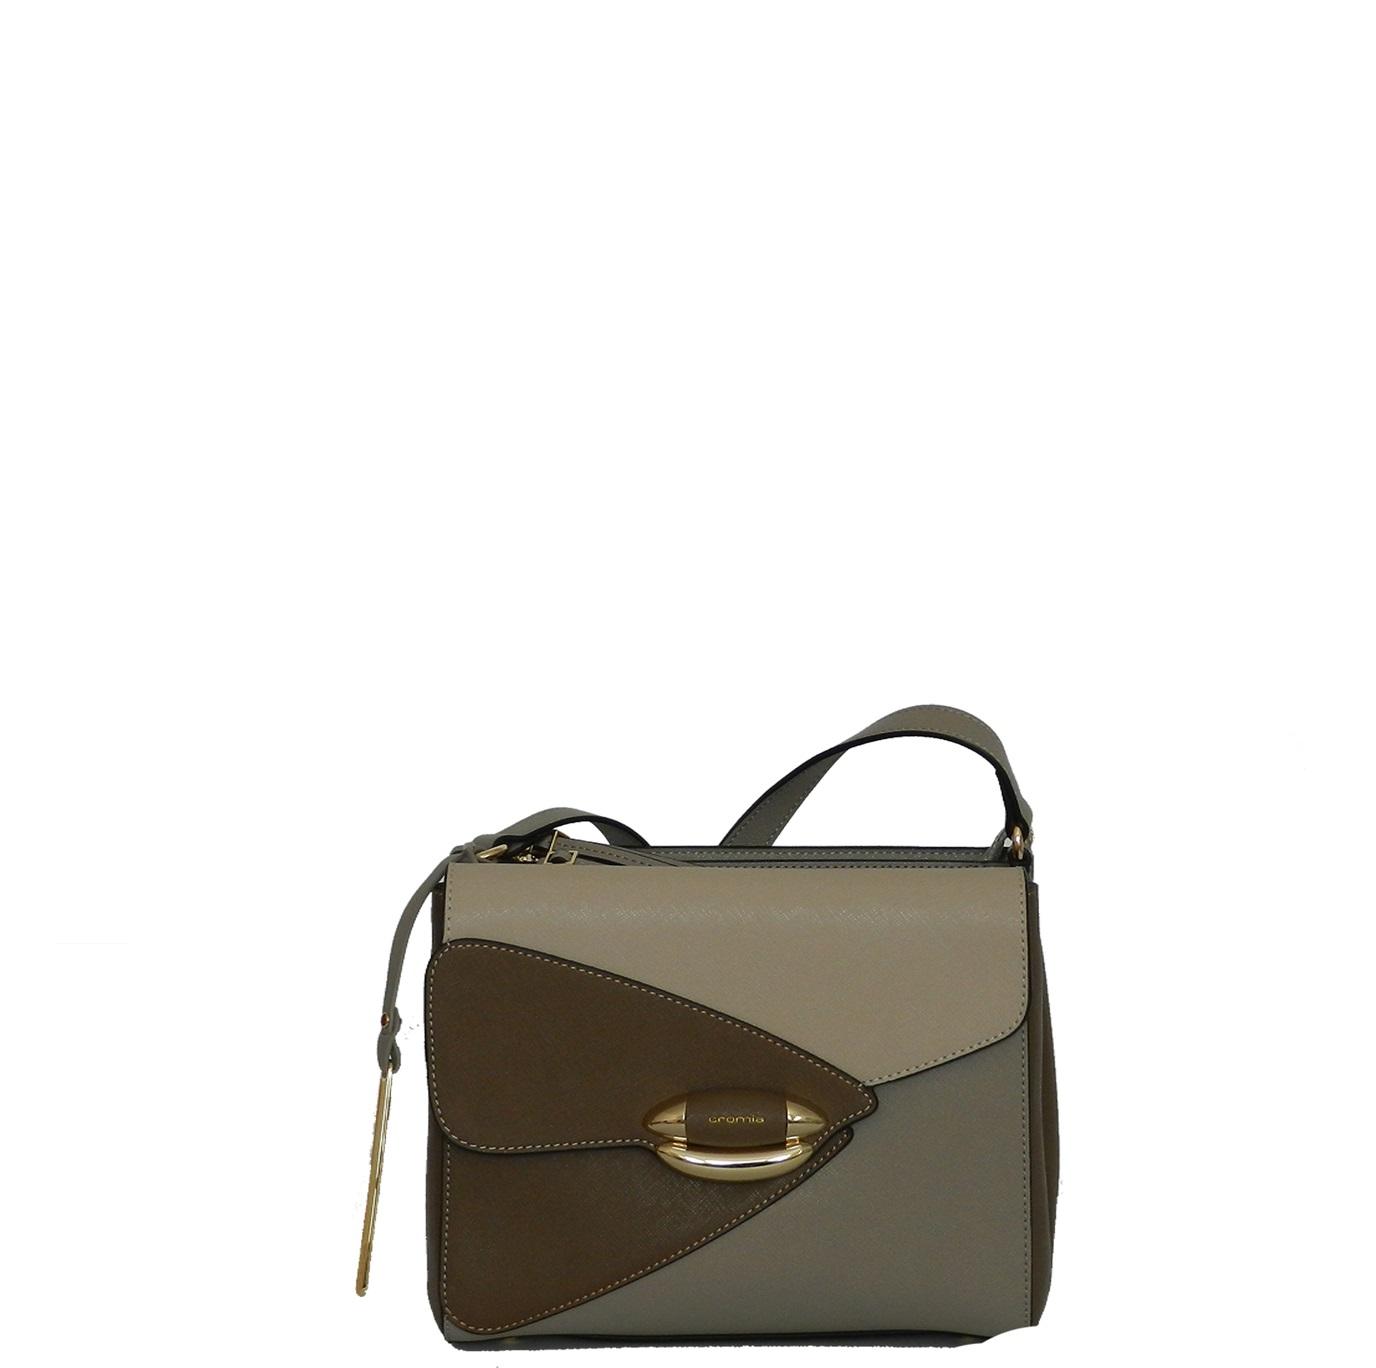 cf0269fc435a Средняя сумка Cromia 1403445 мультиколор - цена 16300 руб, купить